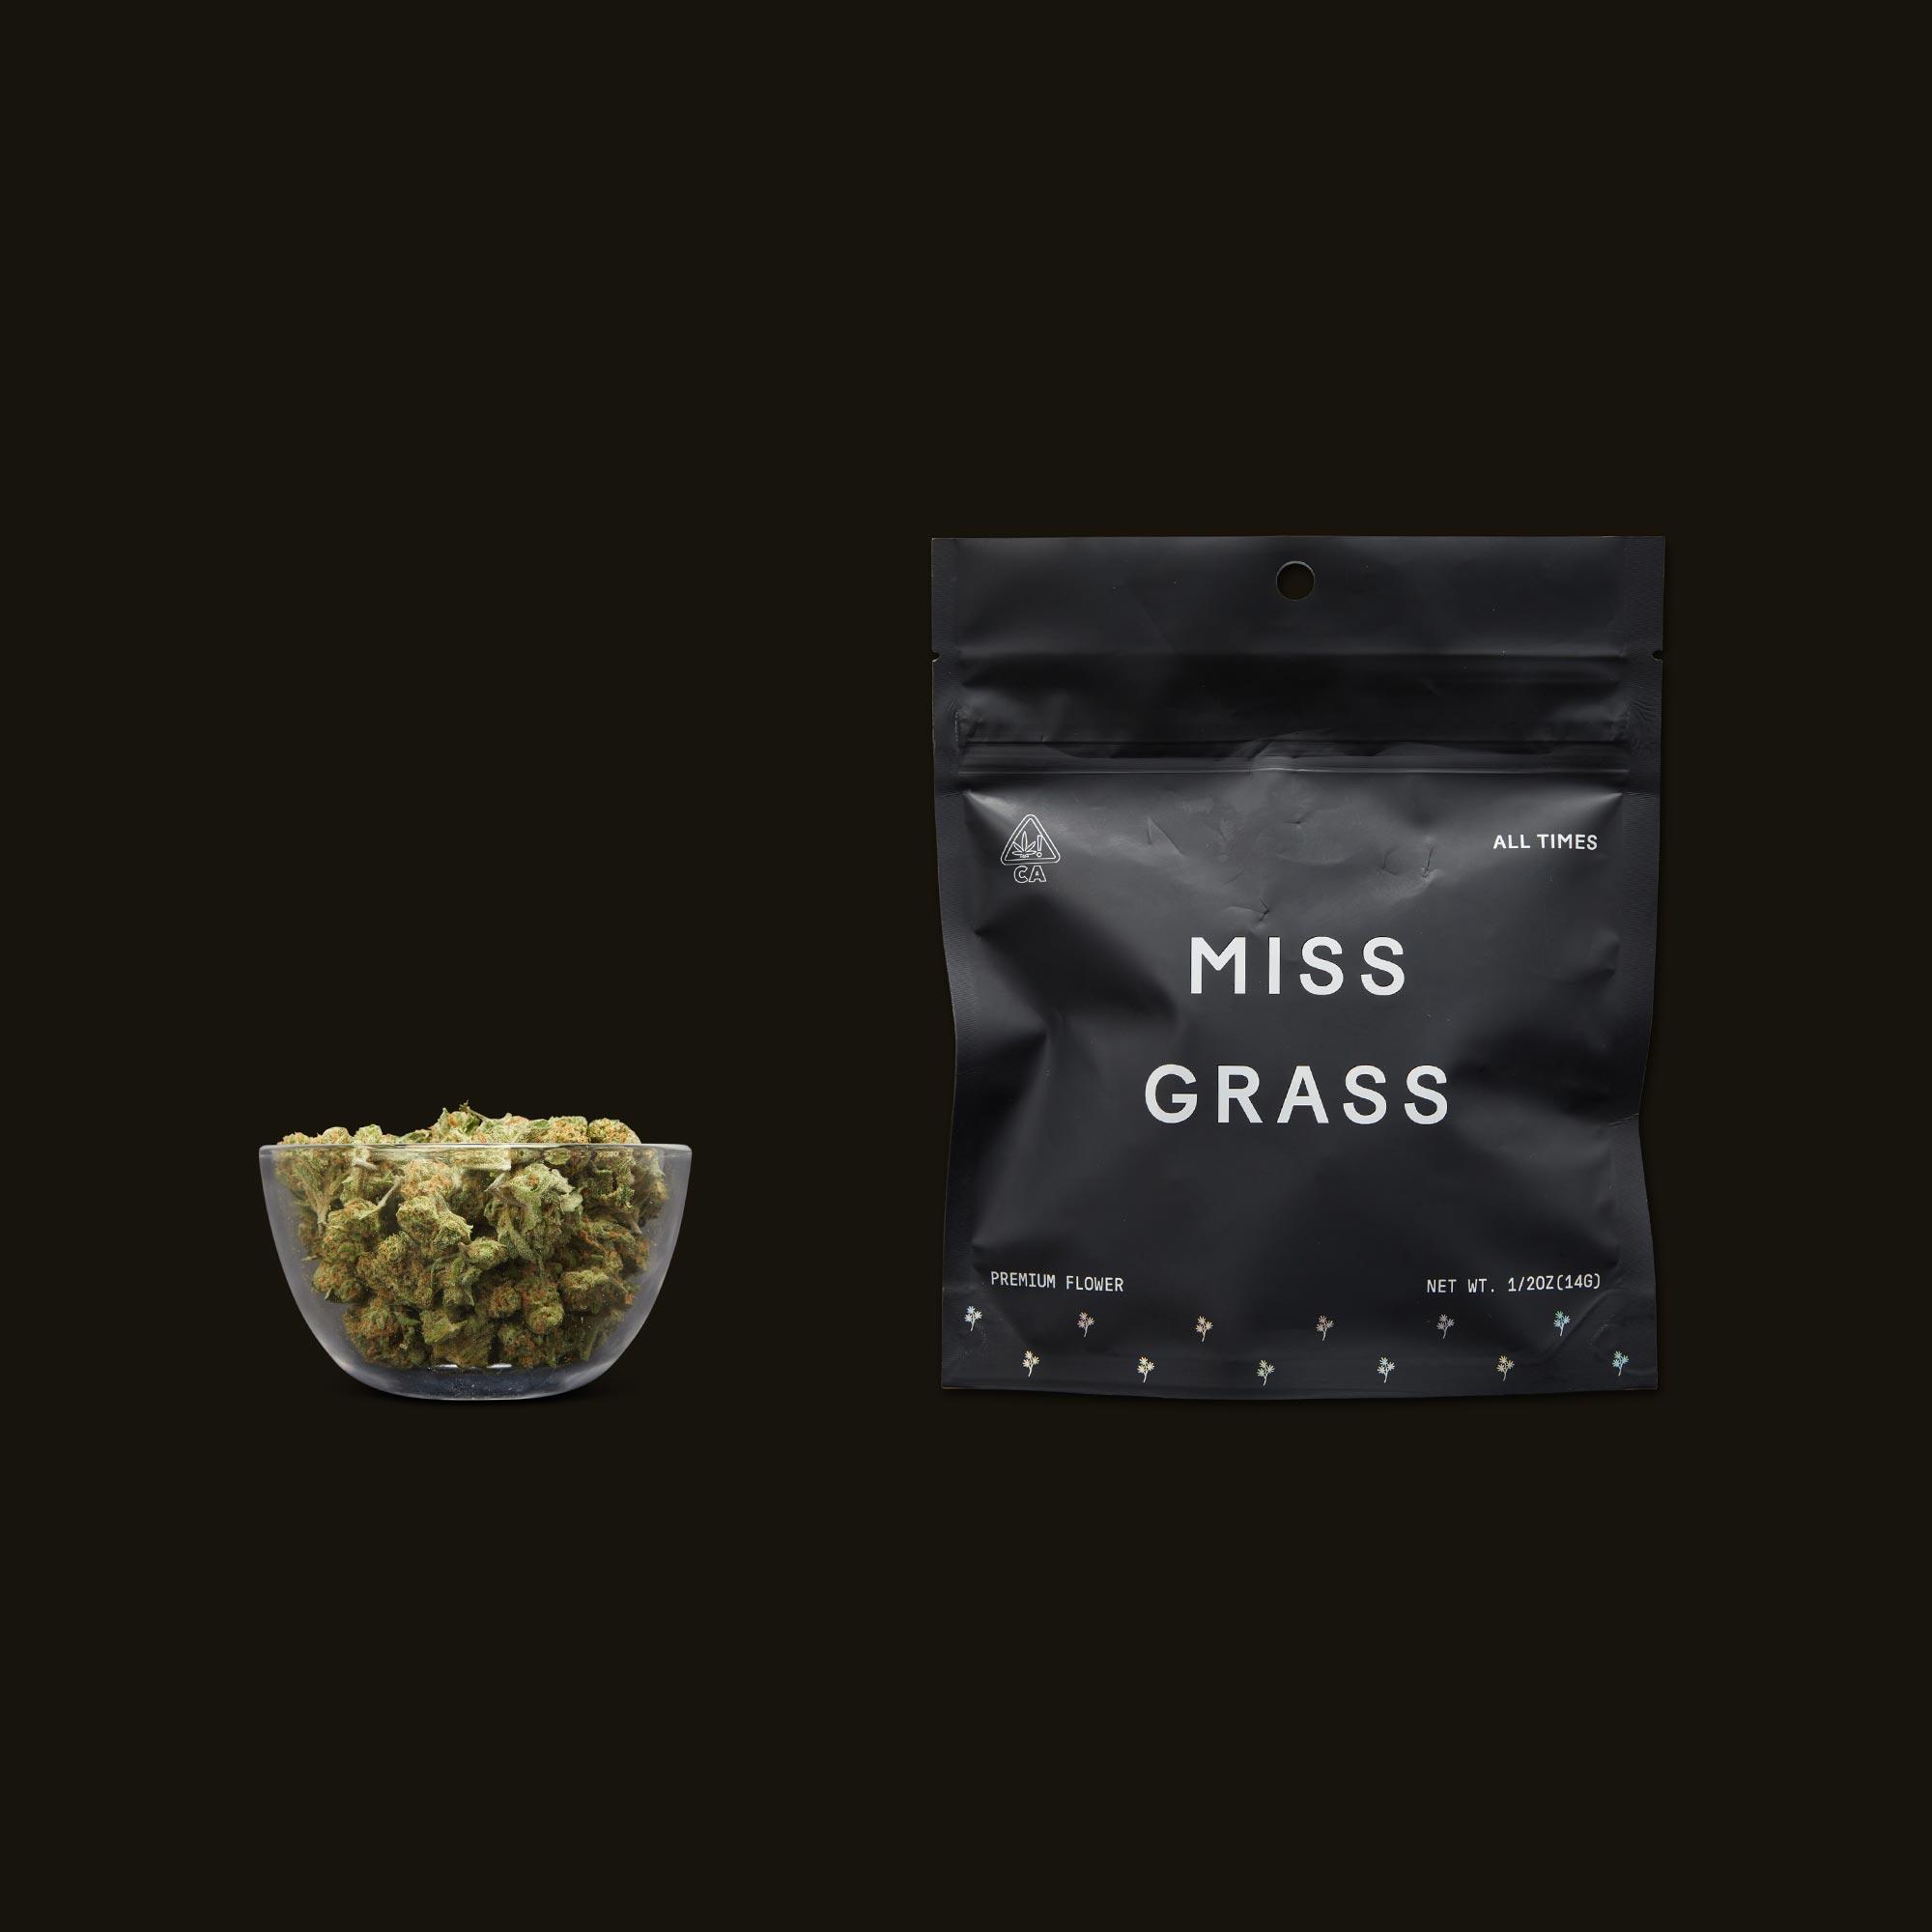 Miss Grass All Times